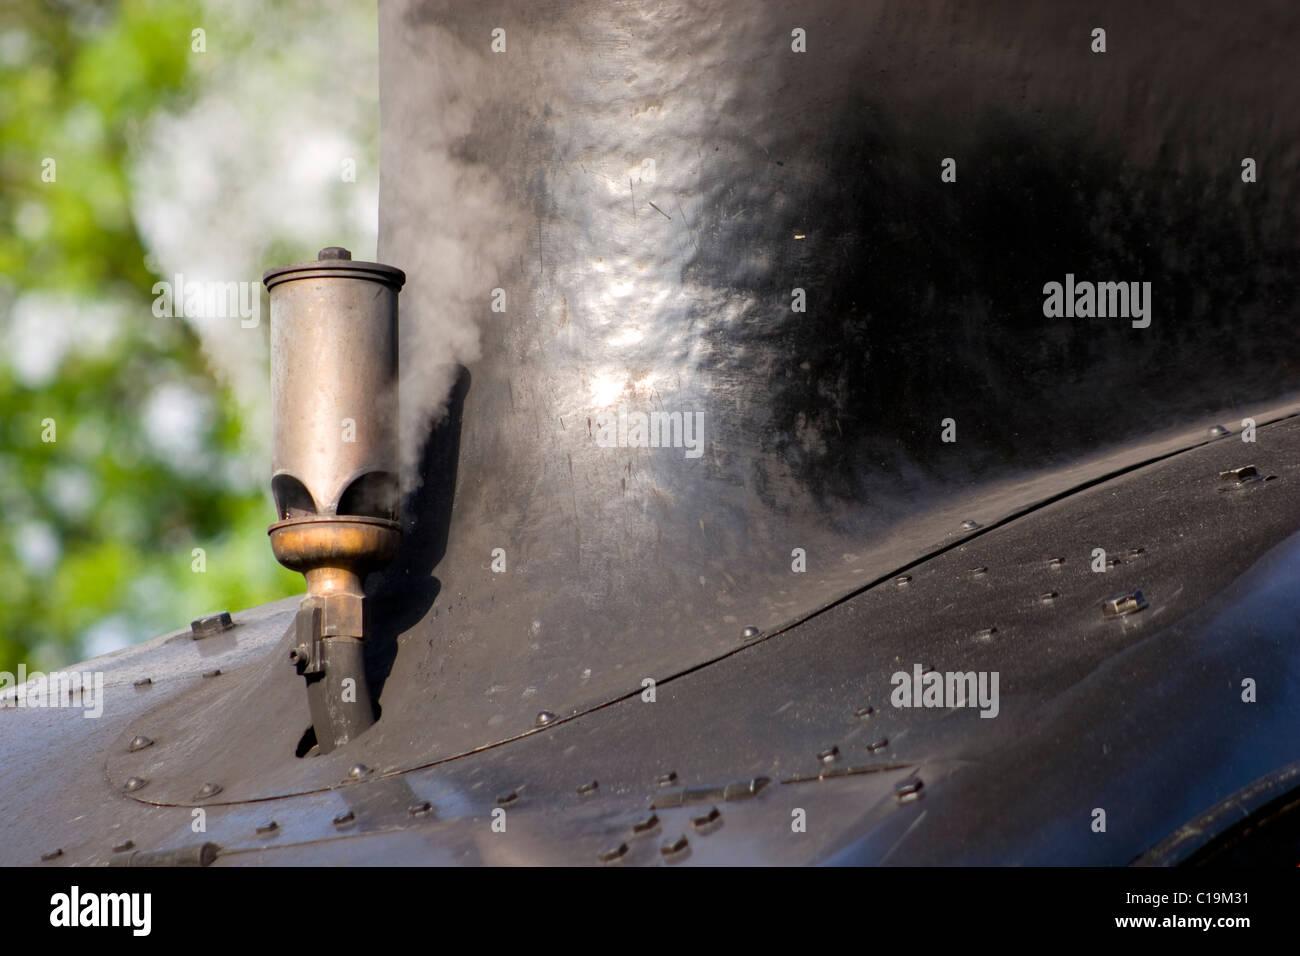 Train Whistle Stock Photos & Train Whistle Stock Images - Alamy